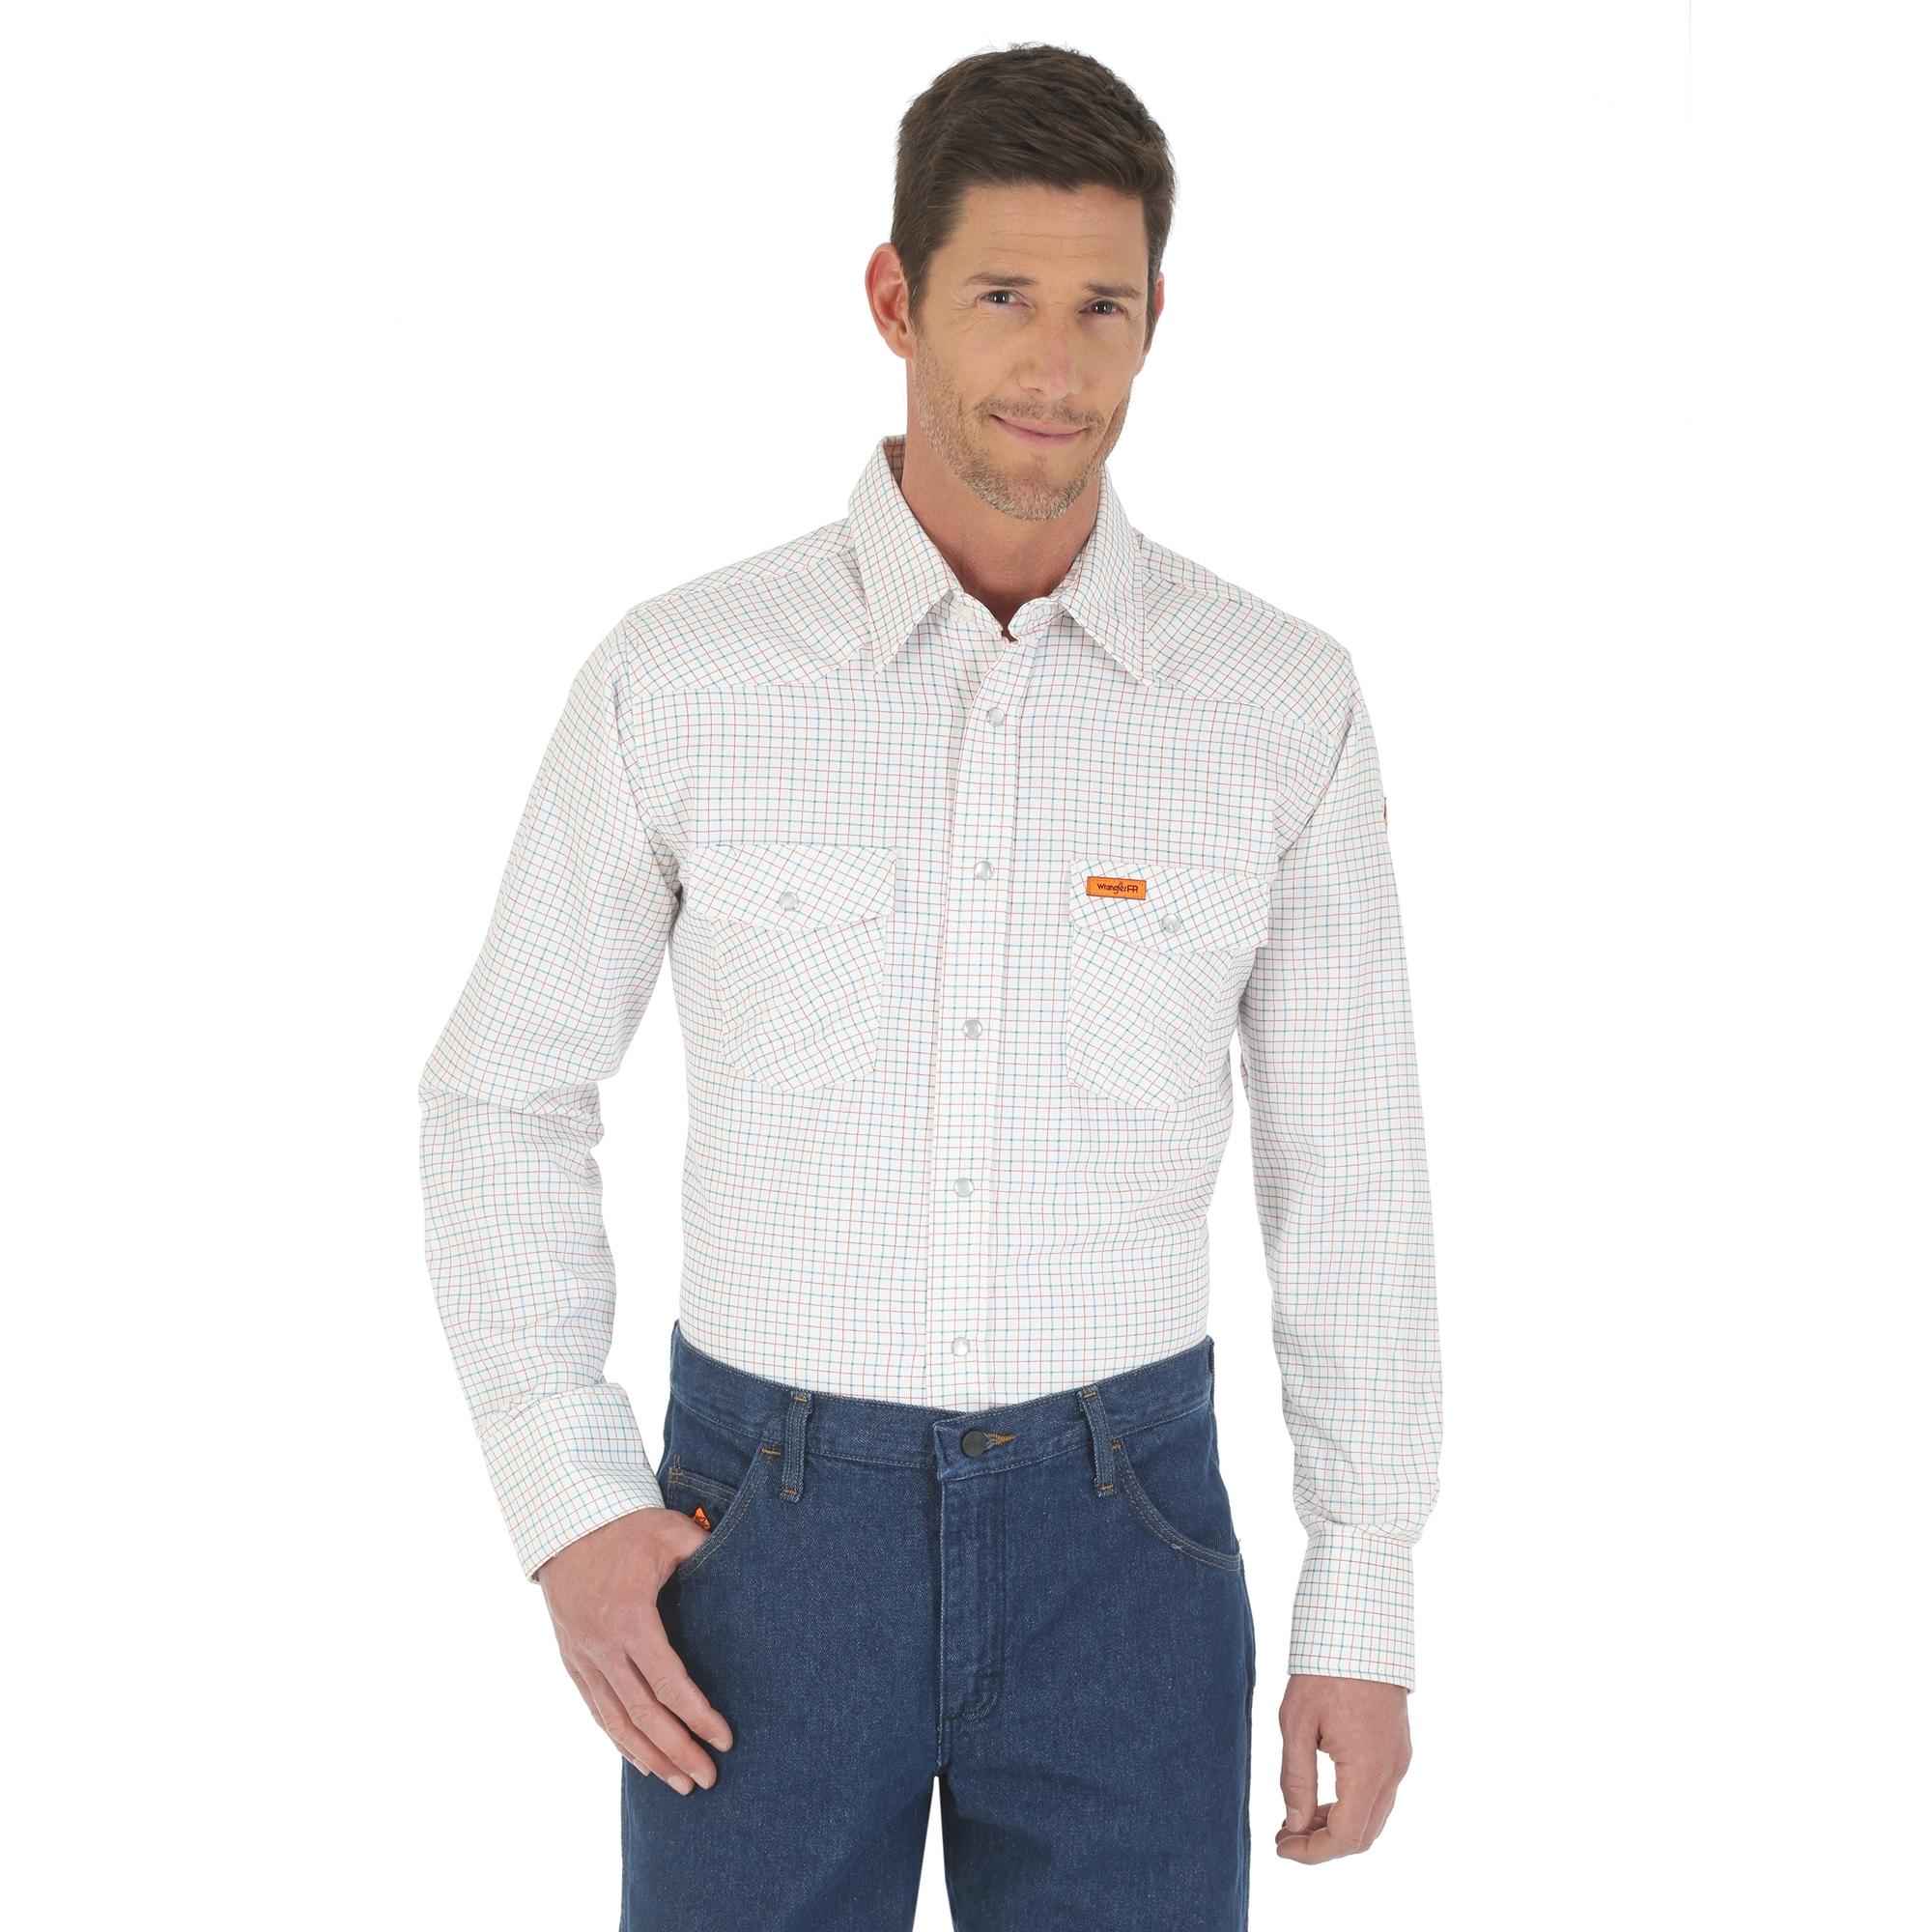 Wrangler Flame Resistant Western Shirt White Fr130wh